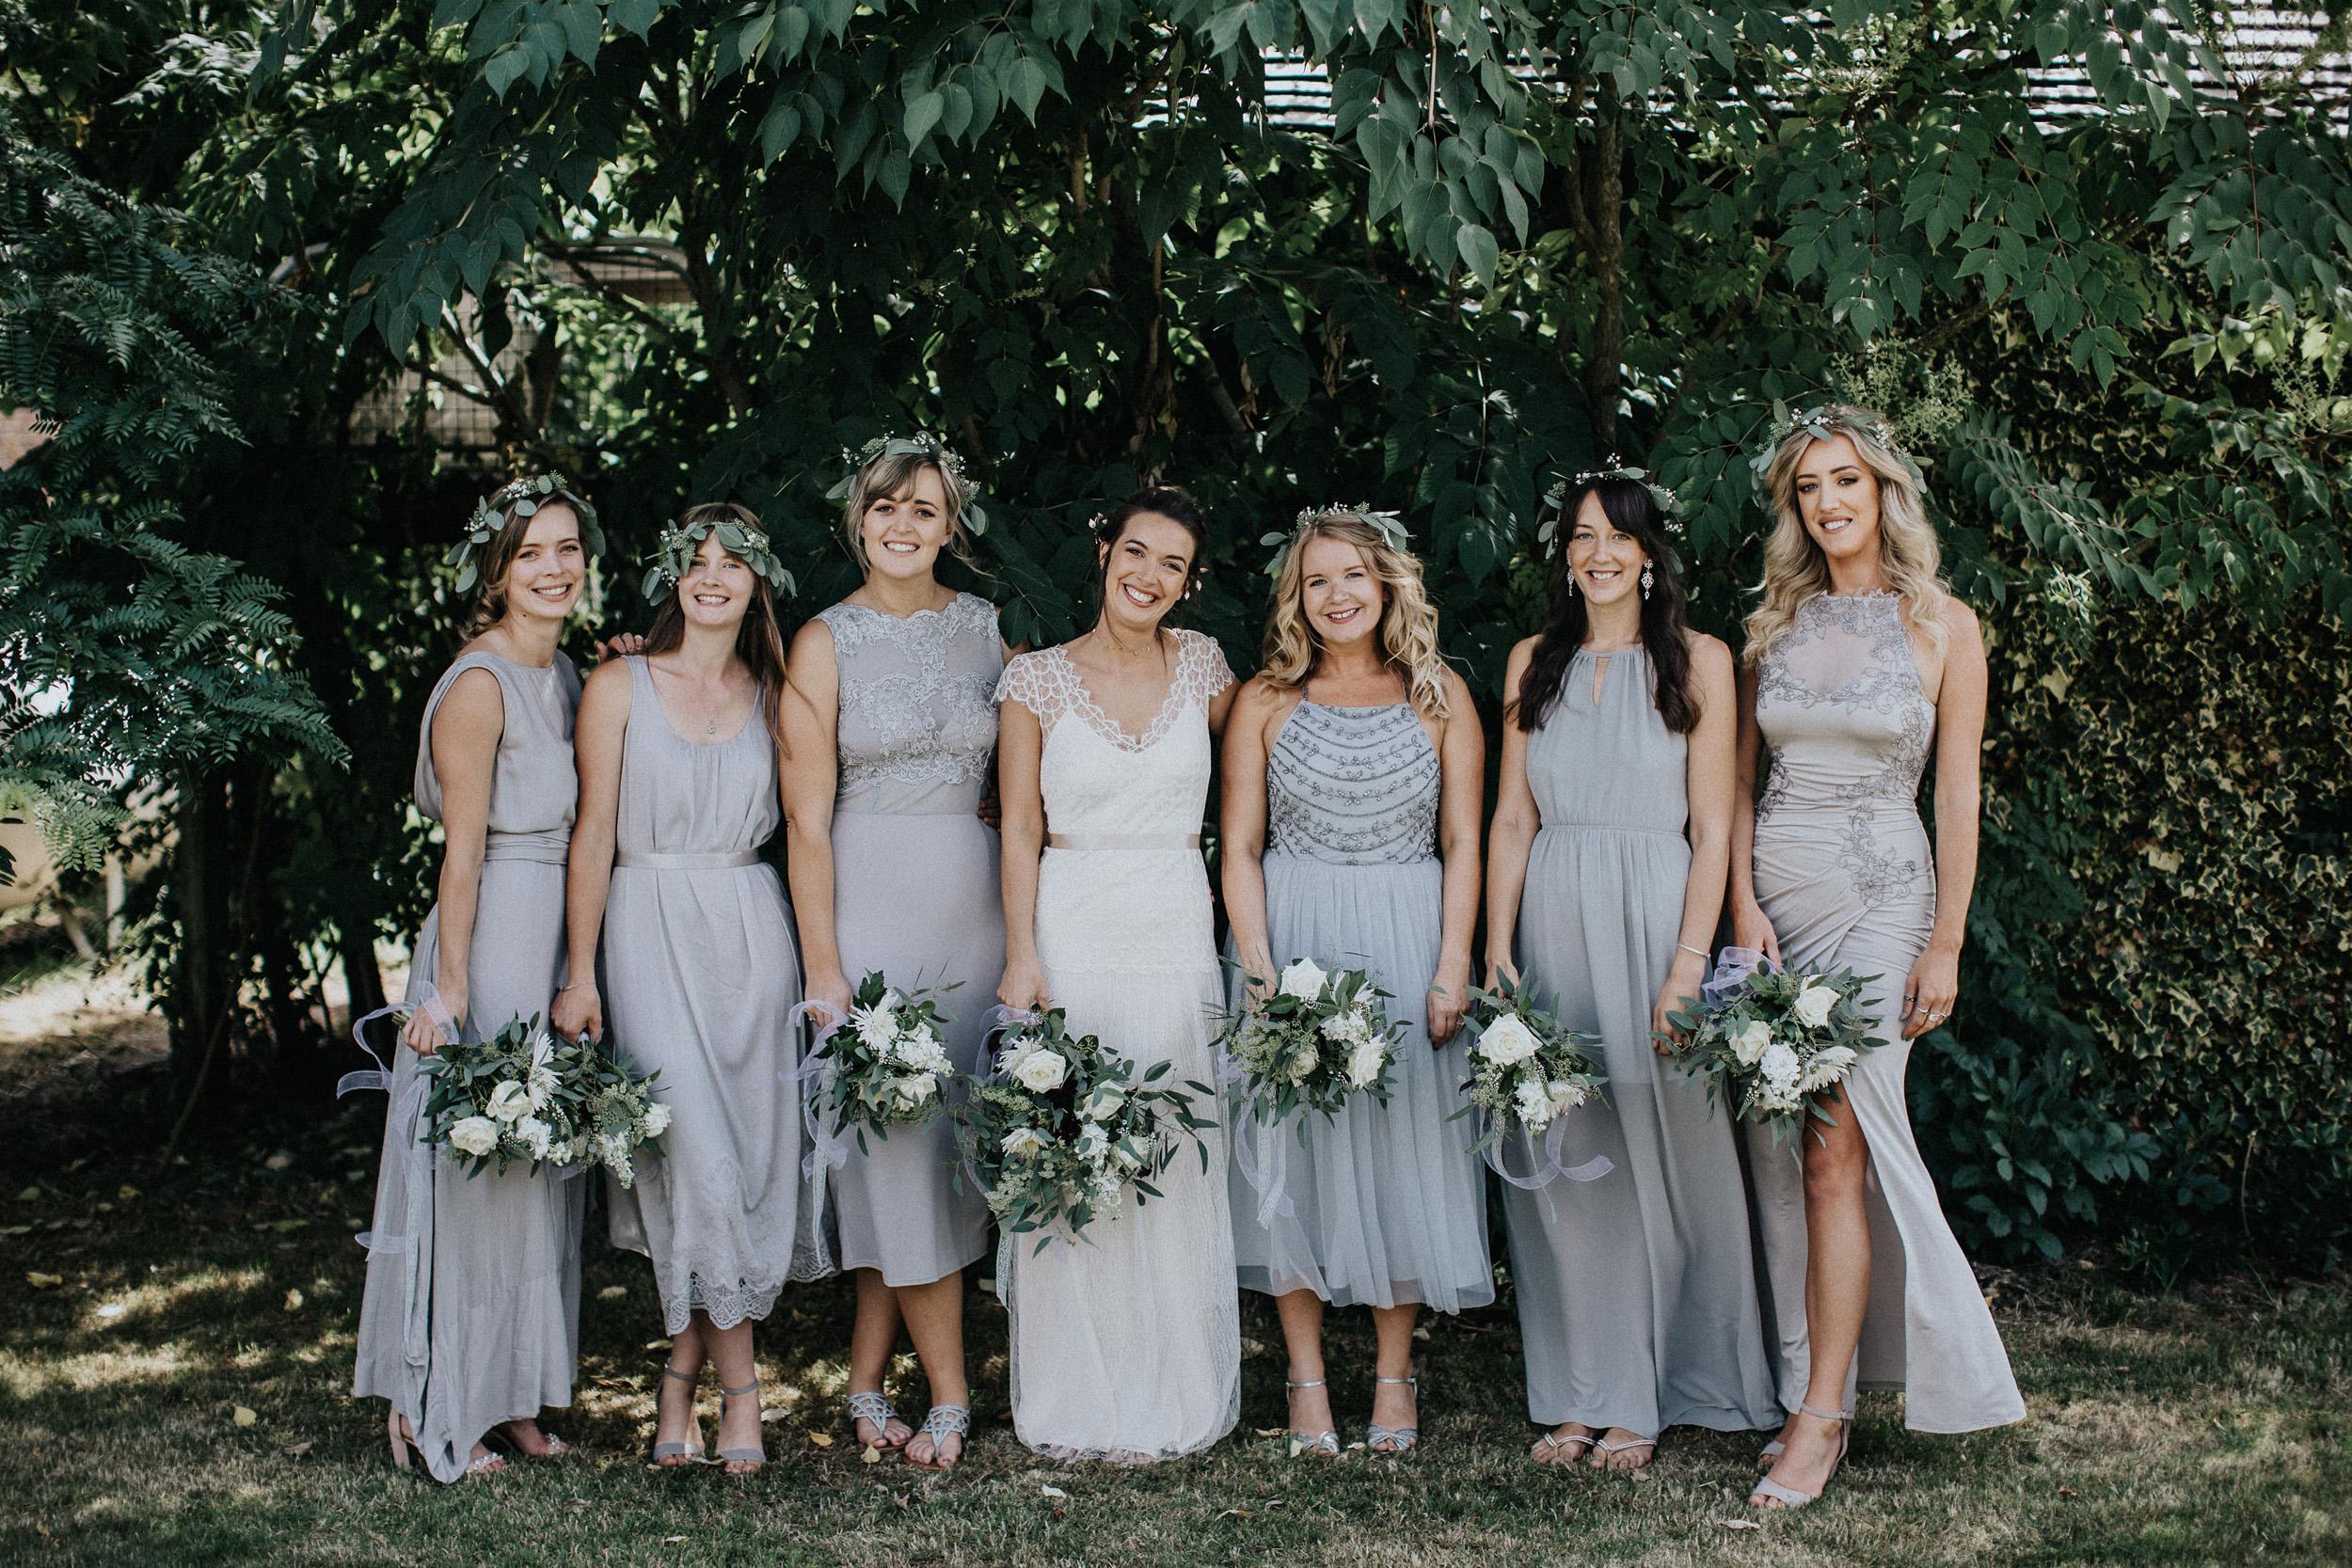 Martha-Laid-Back-Garden-Wedding-Lace-Wedding-Dress-Bohemian-Kate-Beaumont-6.jpg